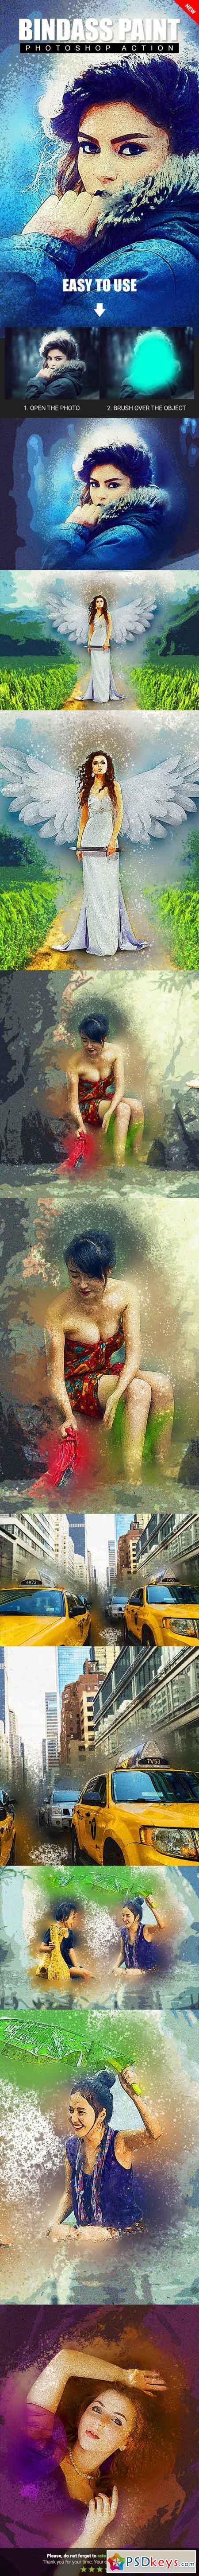 Bindass Paint Photoshop Action 22876838